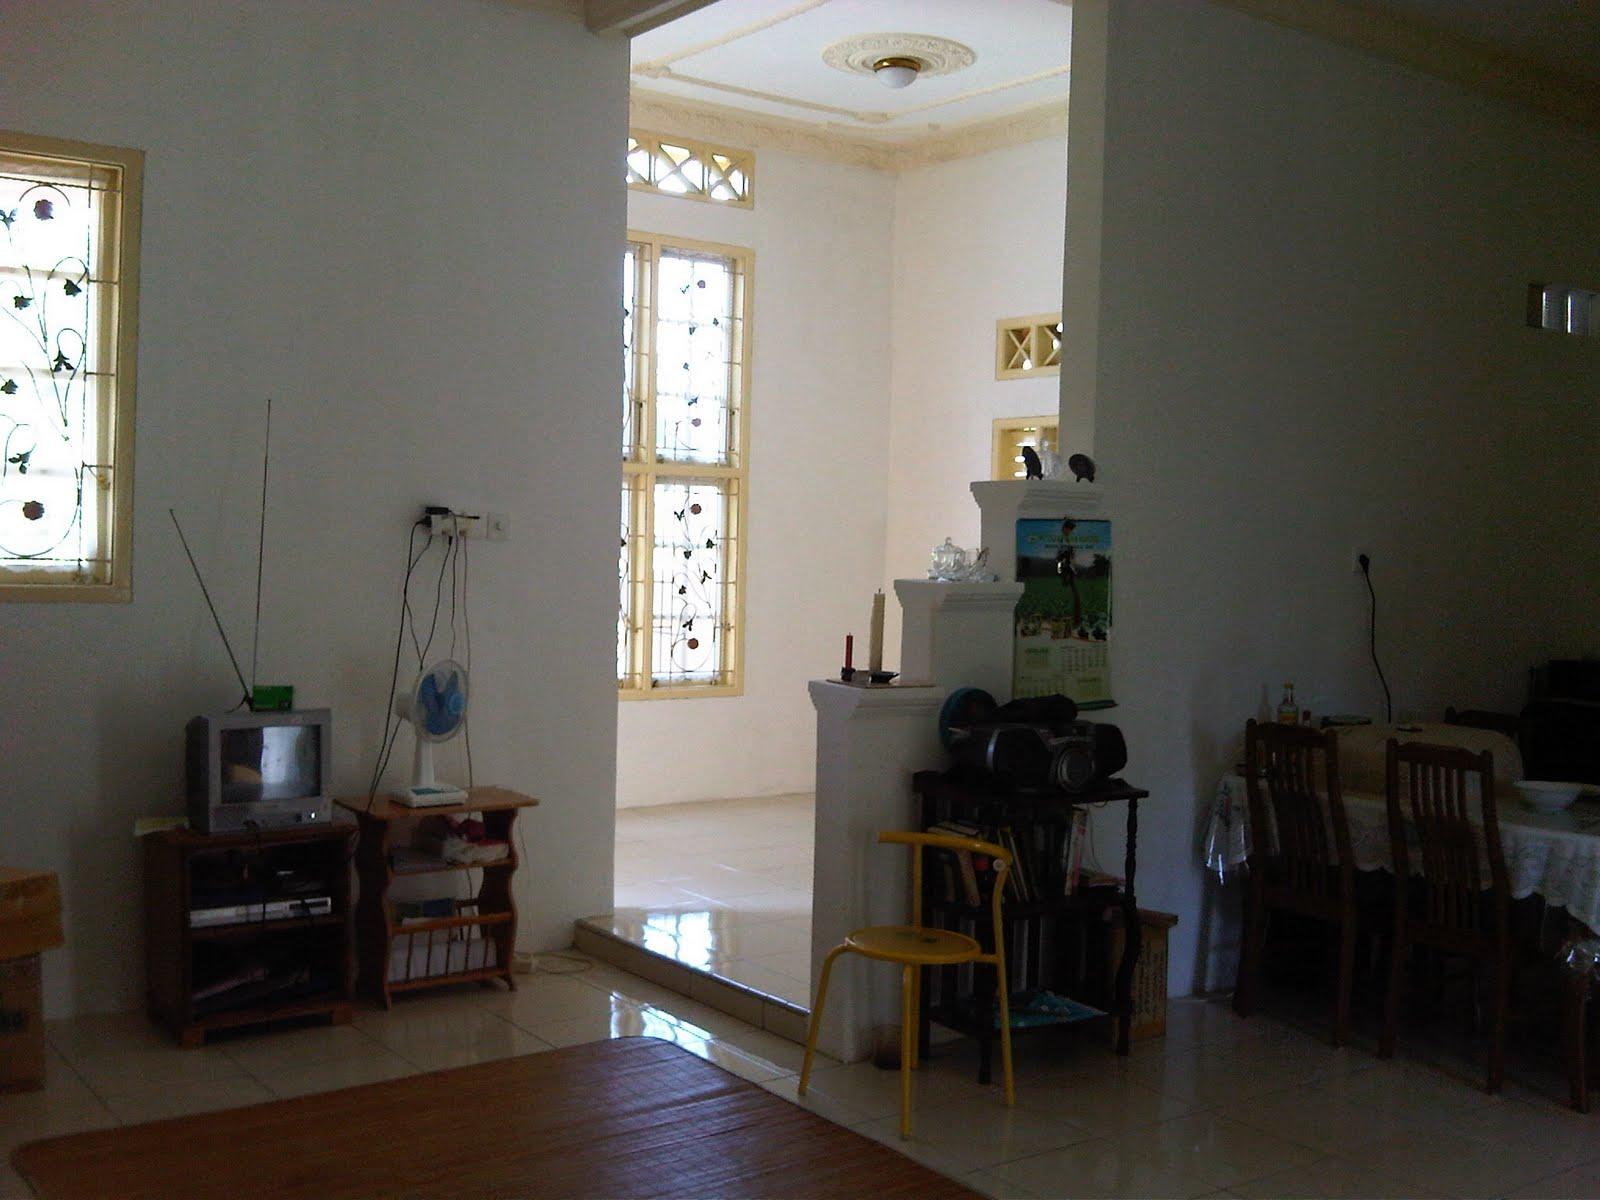 Ruang tamu dan ruang keluarga